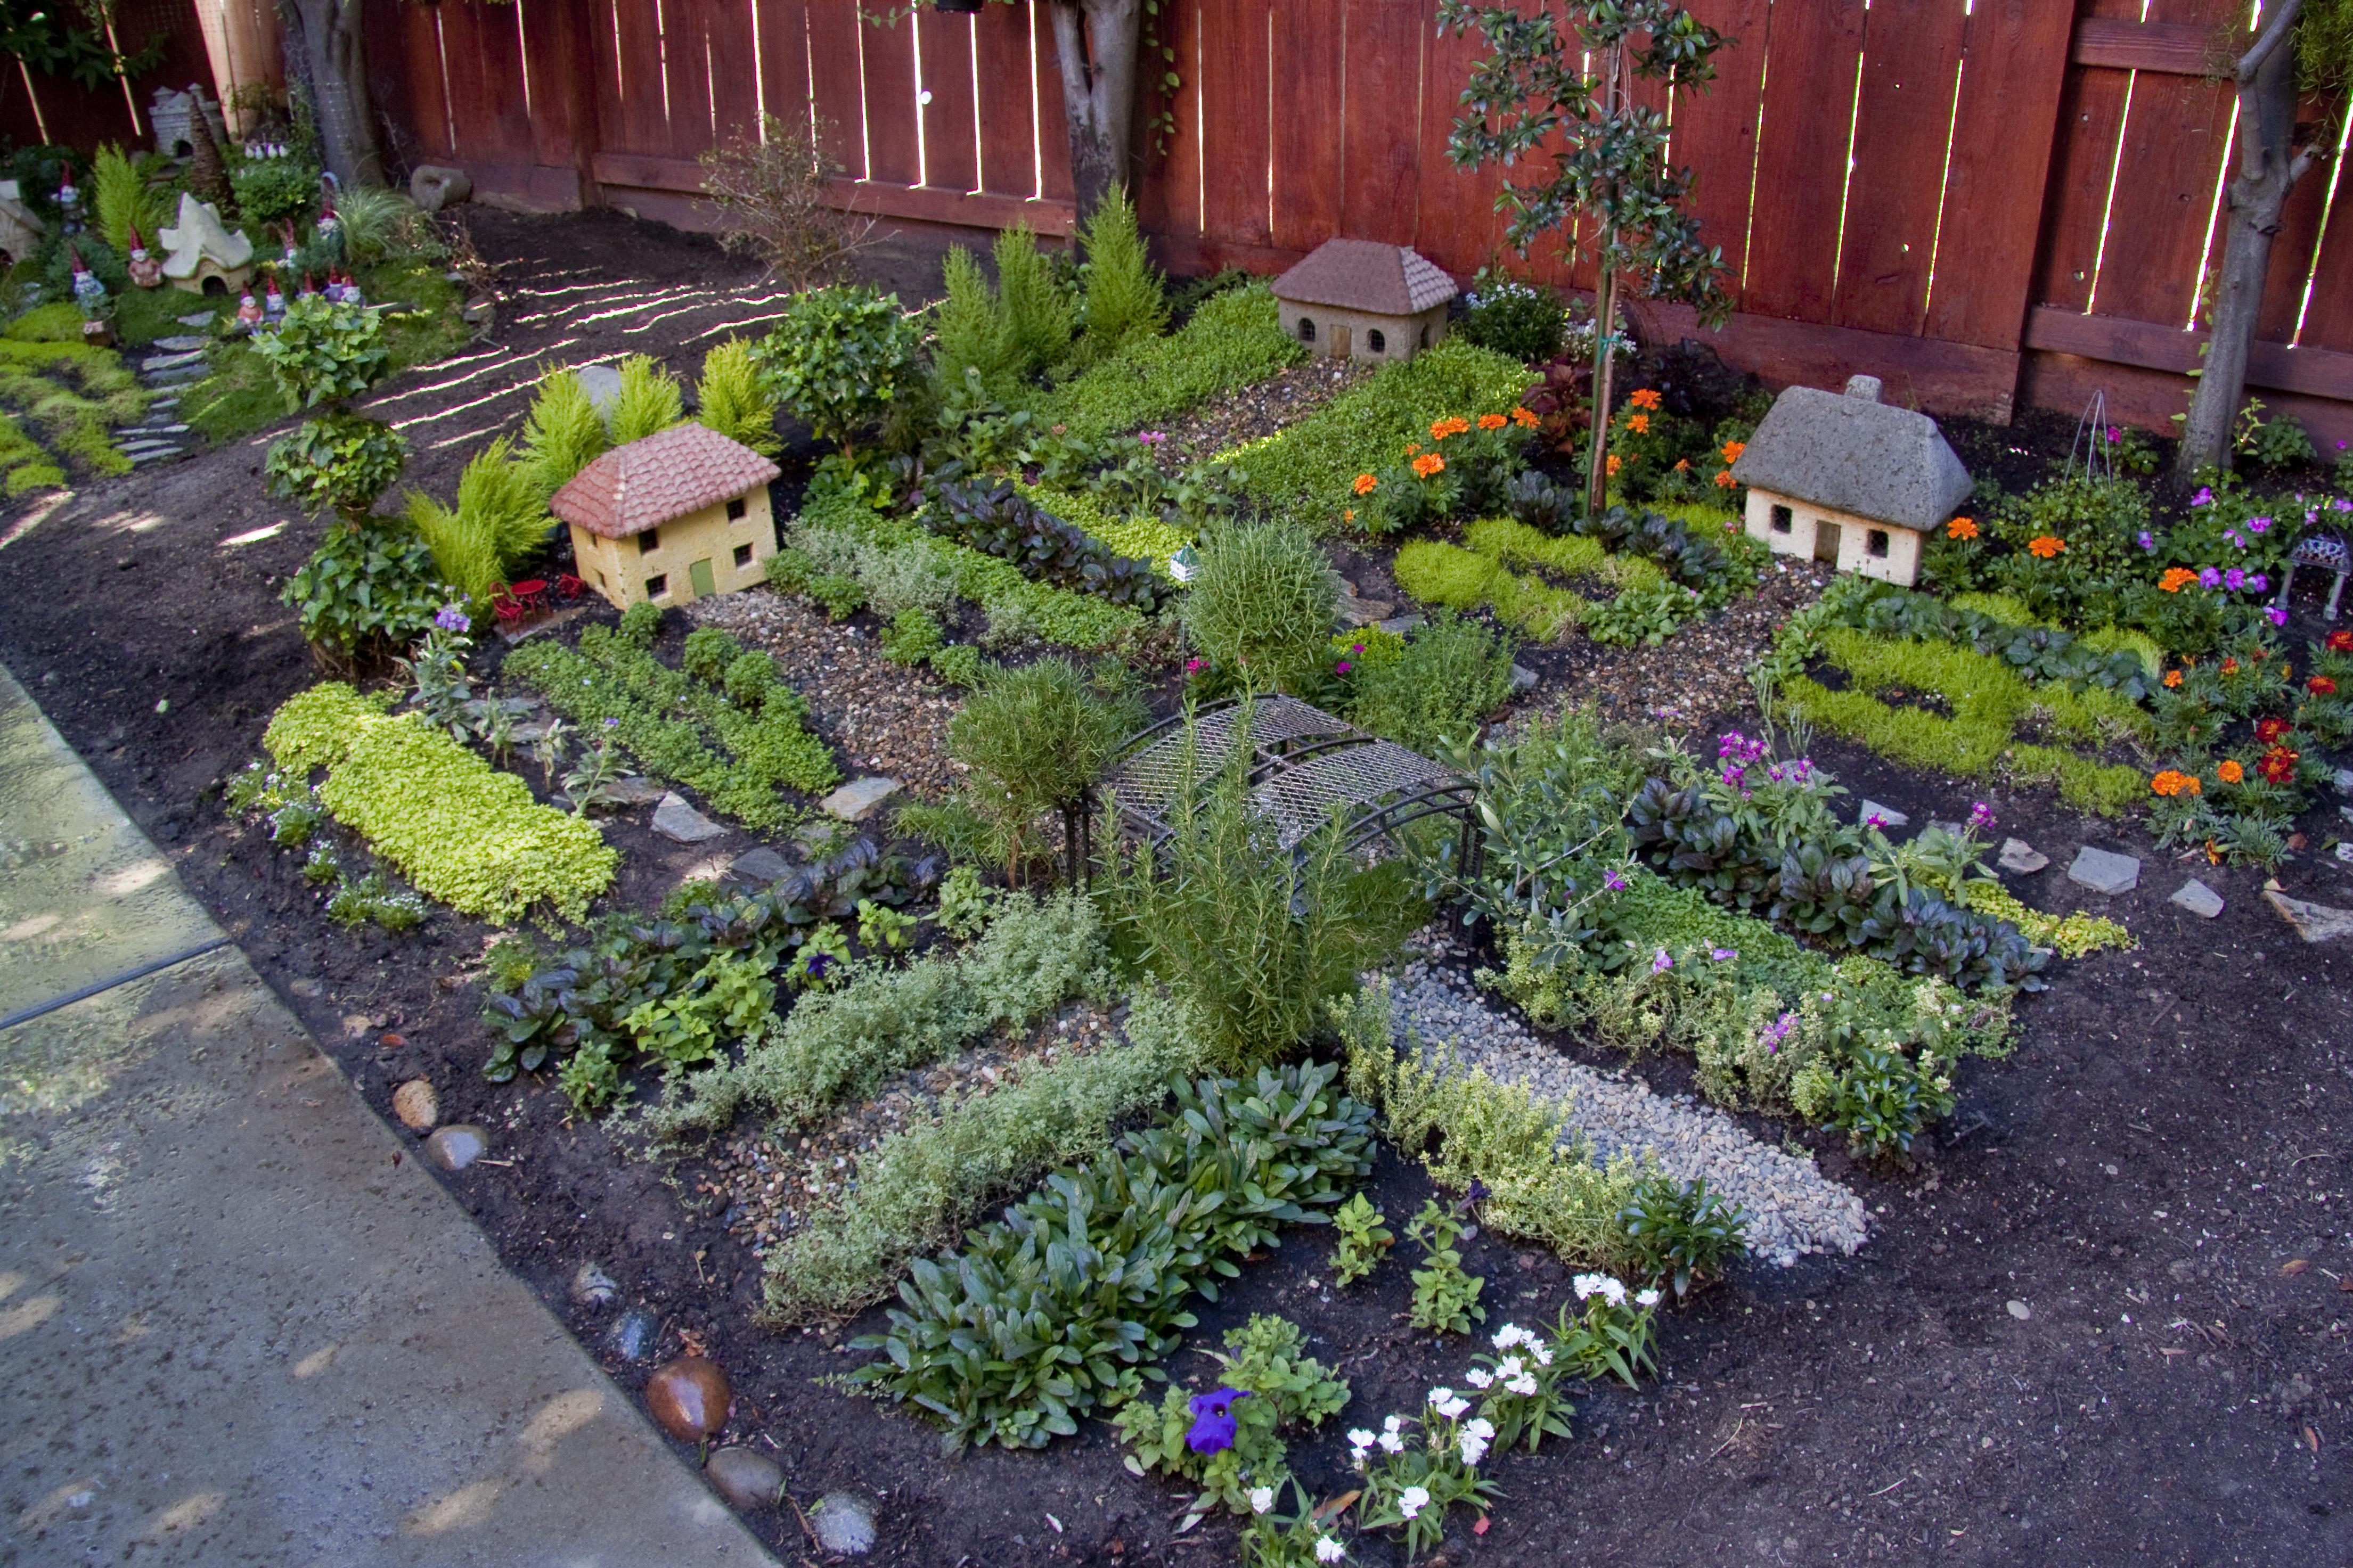 nancys miniature garden - Gnome Garden